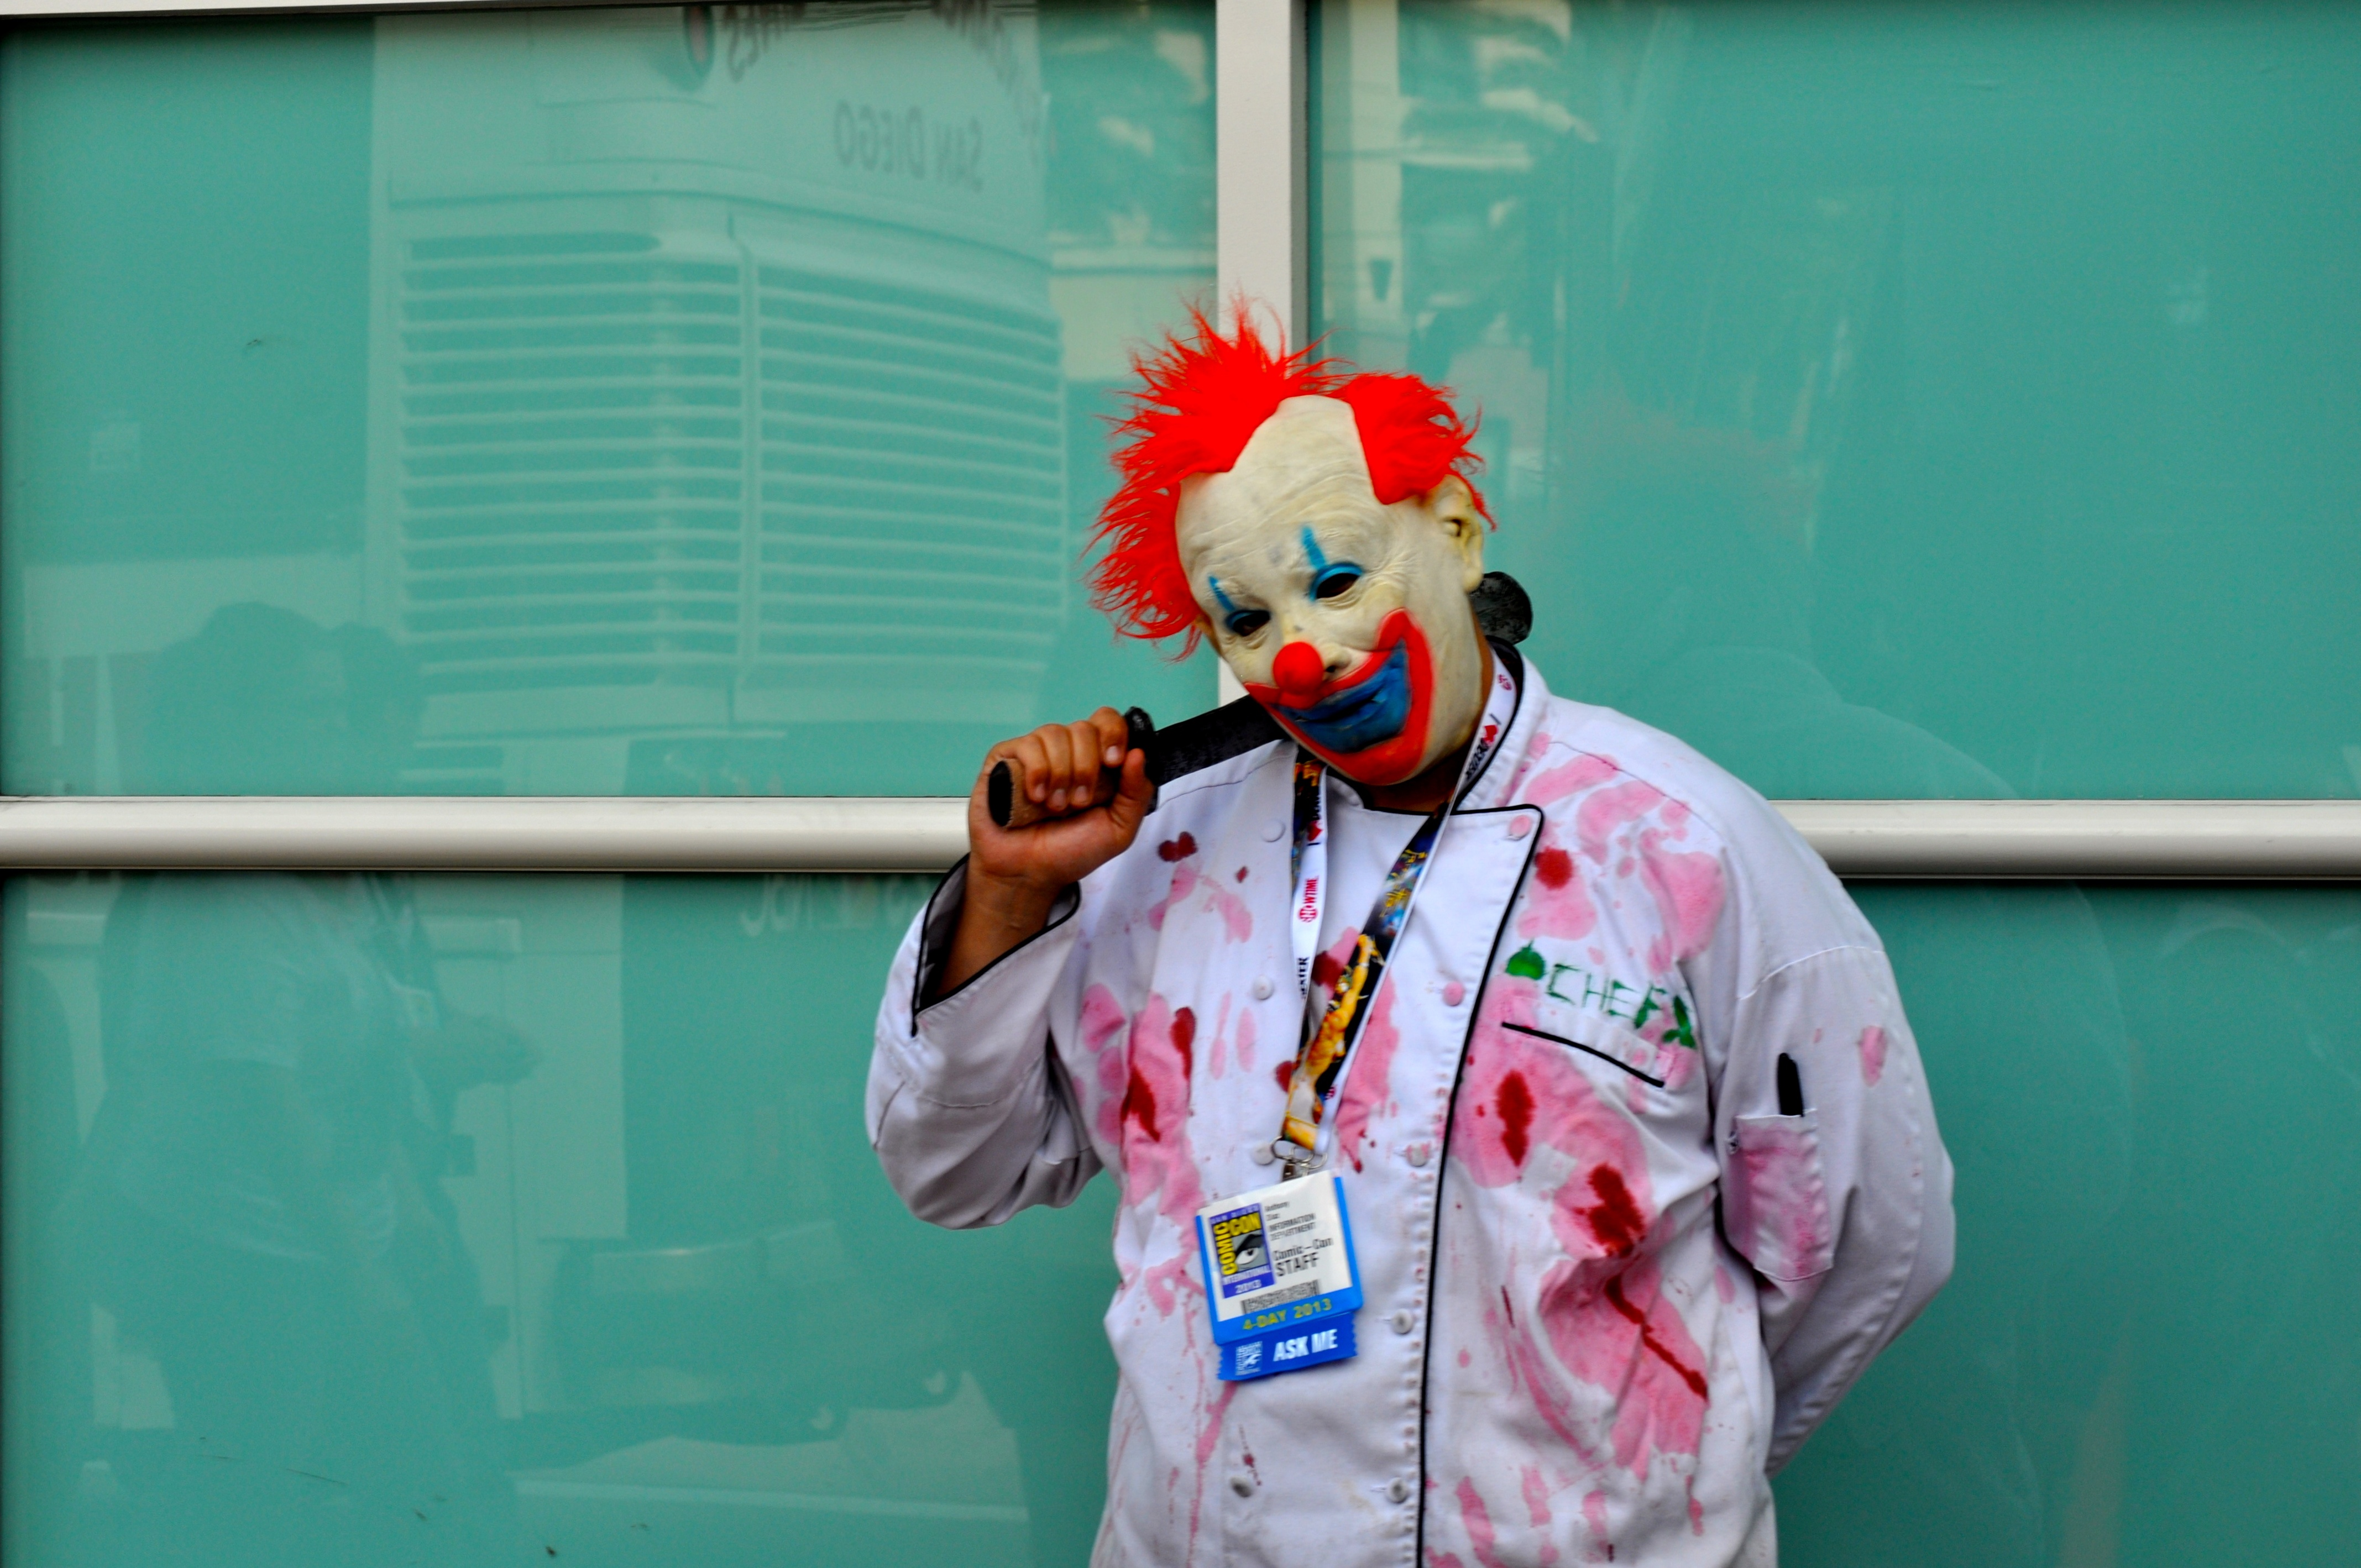 Photo: Killer clown cosplayer. Photo courtesy of Wikimedia Commons.